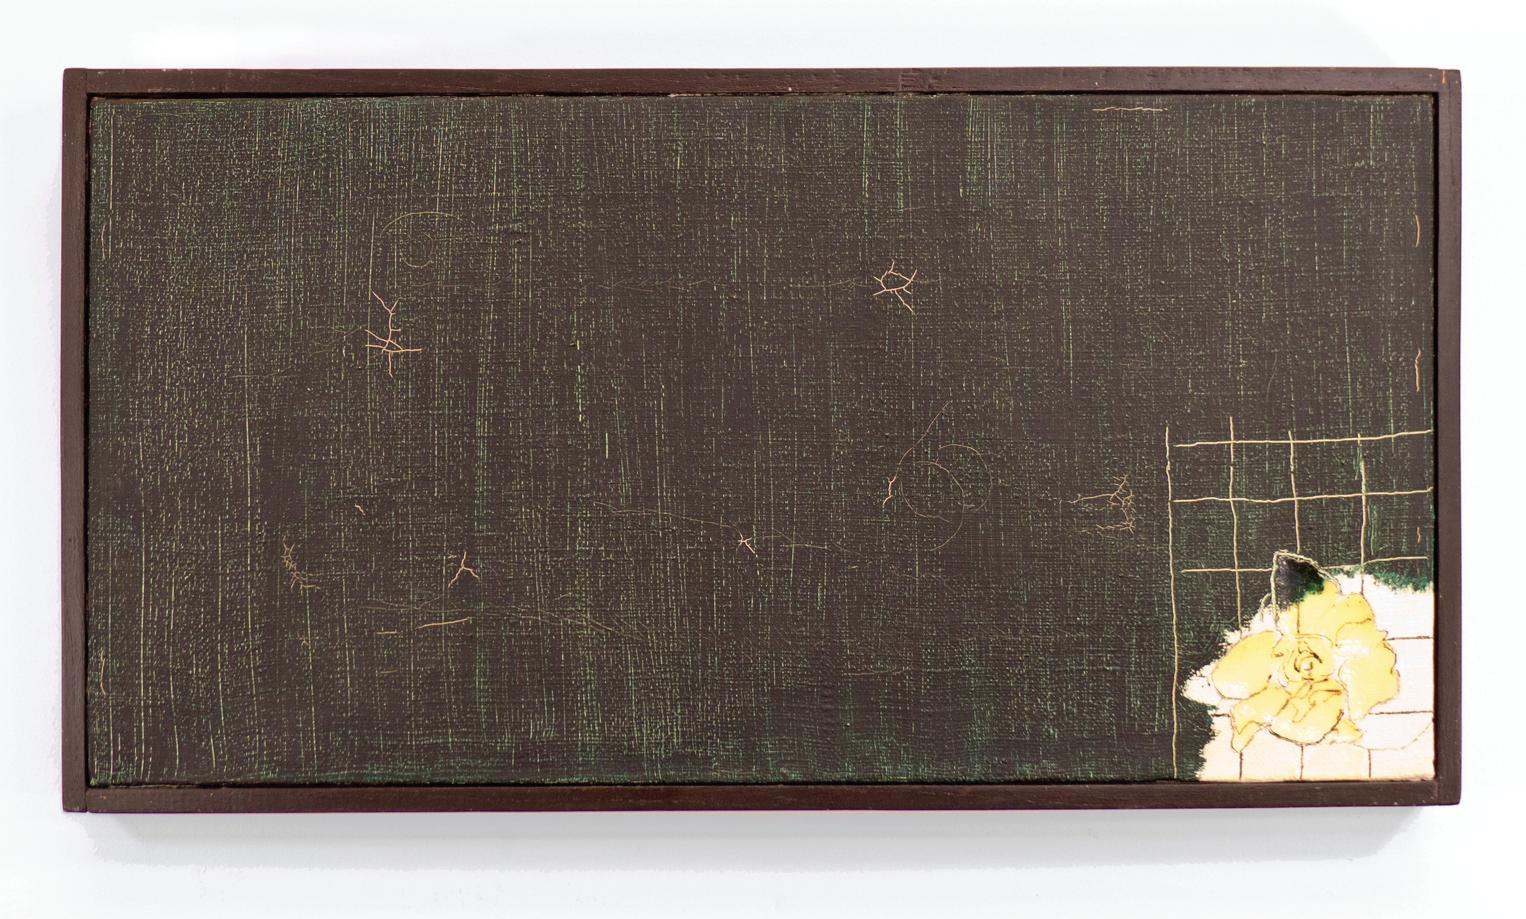 "Climbing Gardenia; 1965; Oil, Magna, Ink, Glue on canvas or Hessian; 20 1⁄2 x 10 5/8"" Framed; Item #029"